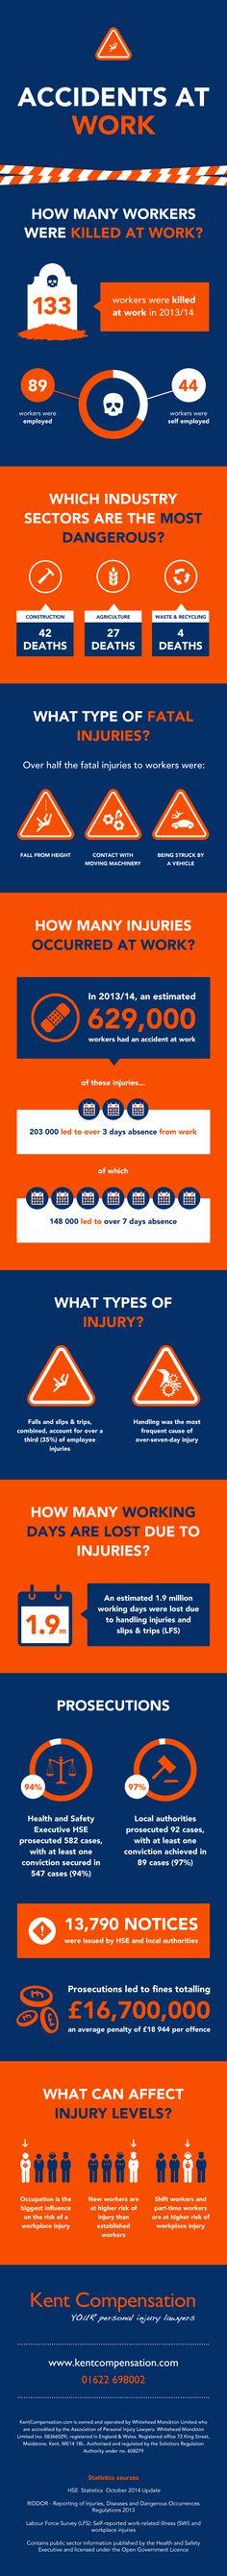 injury claims - http://www.girlingspersonalinjury.co.uk/